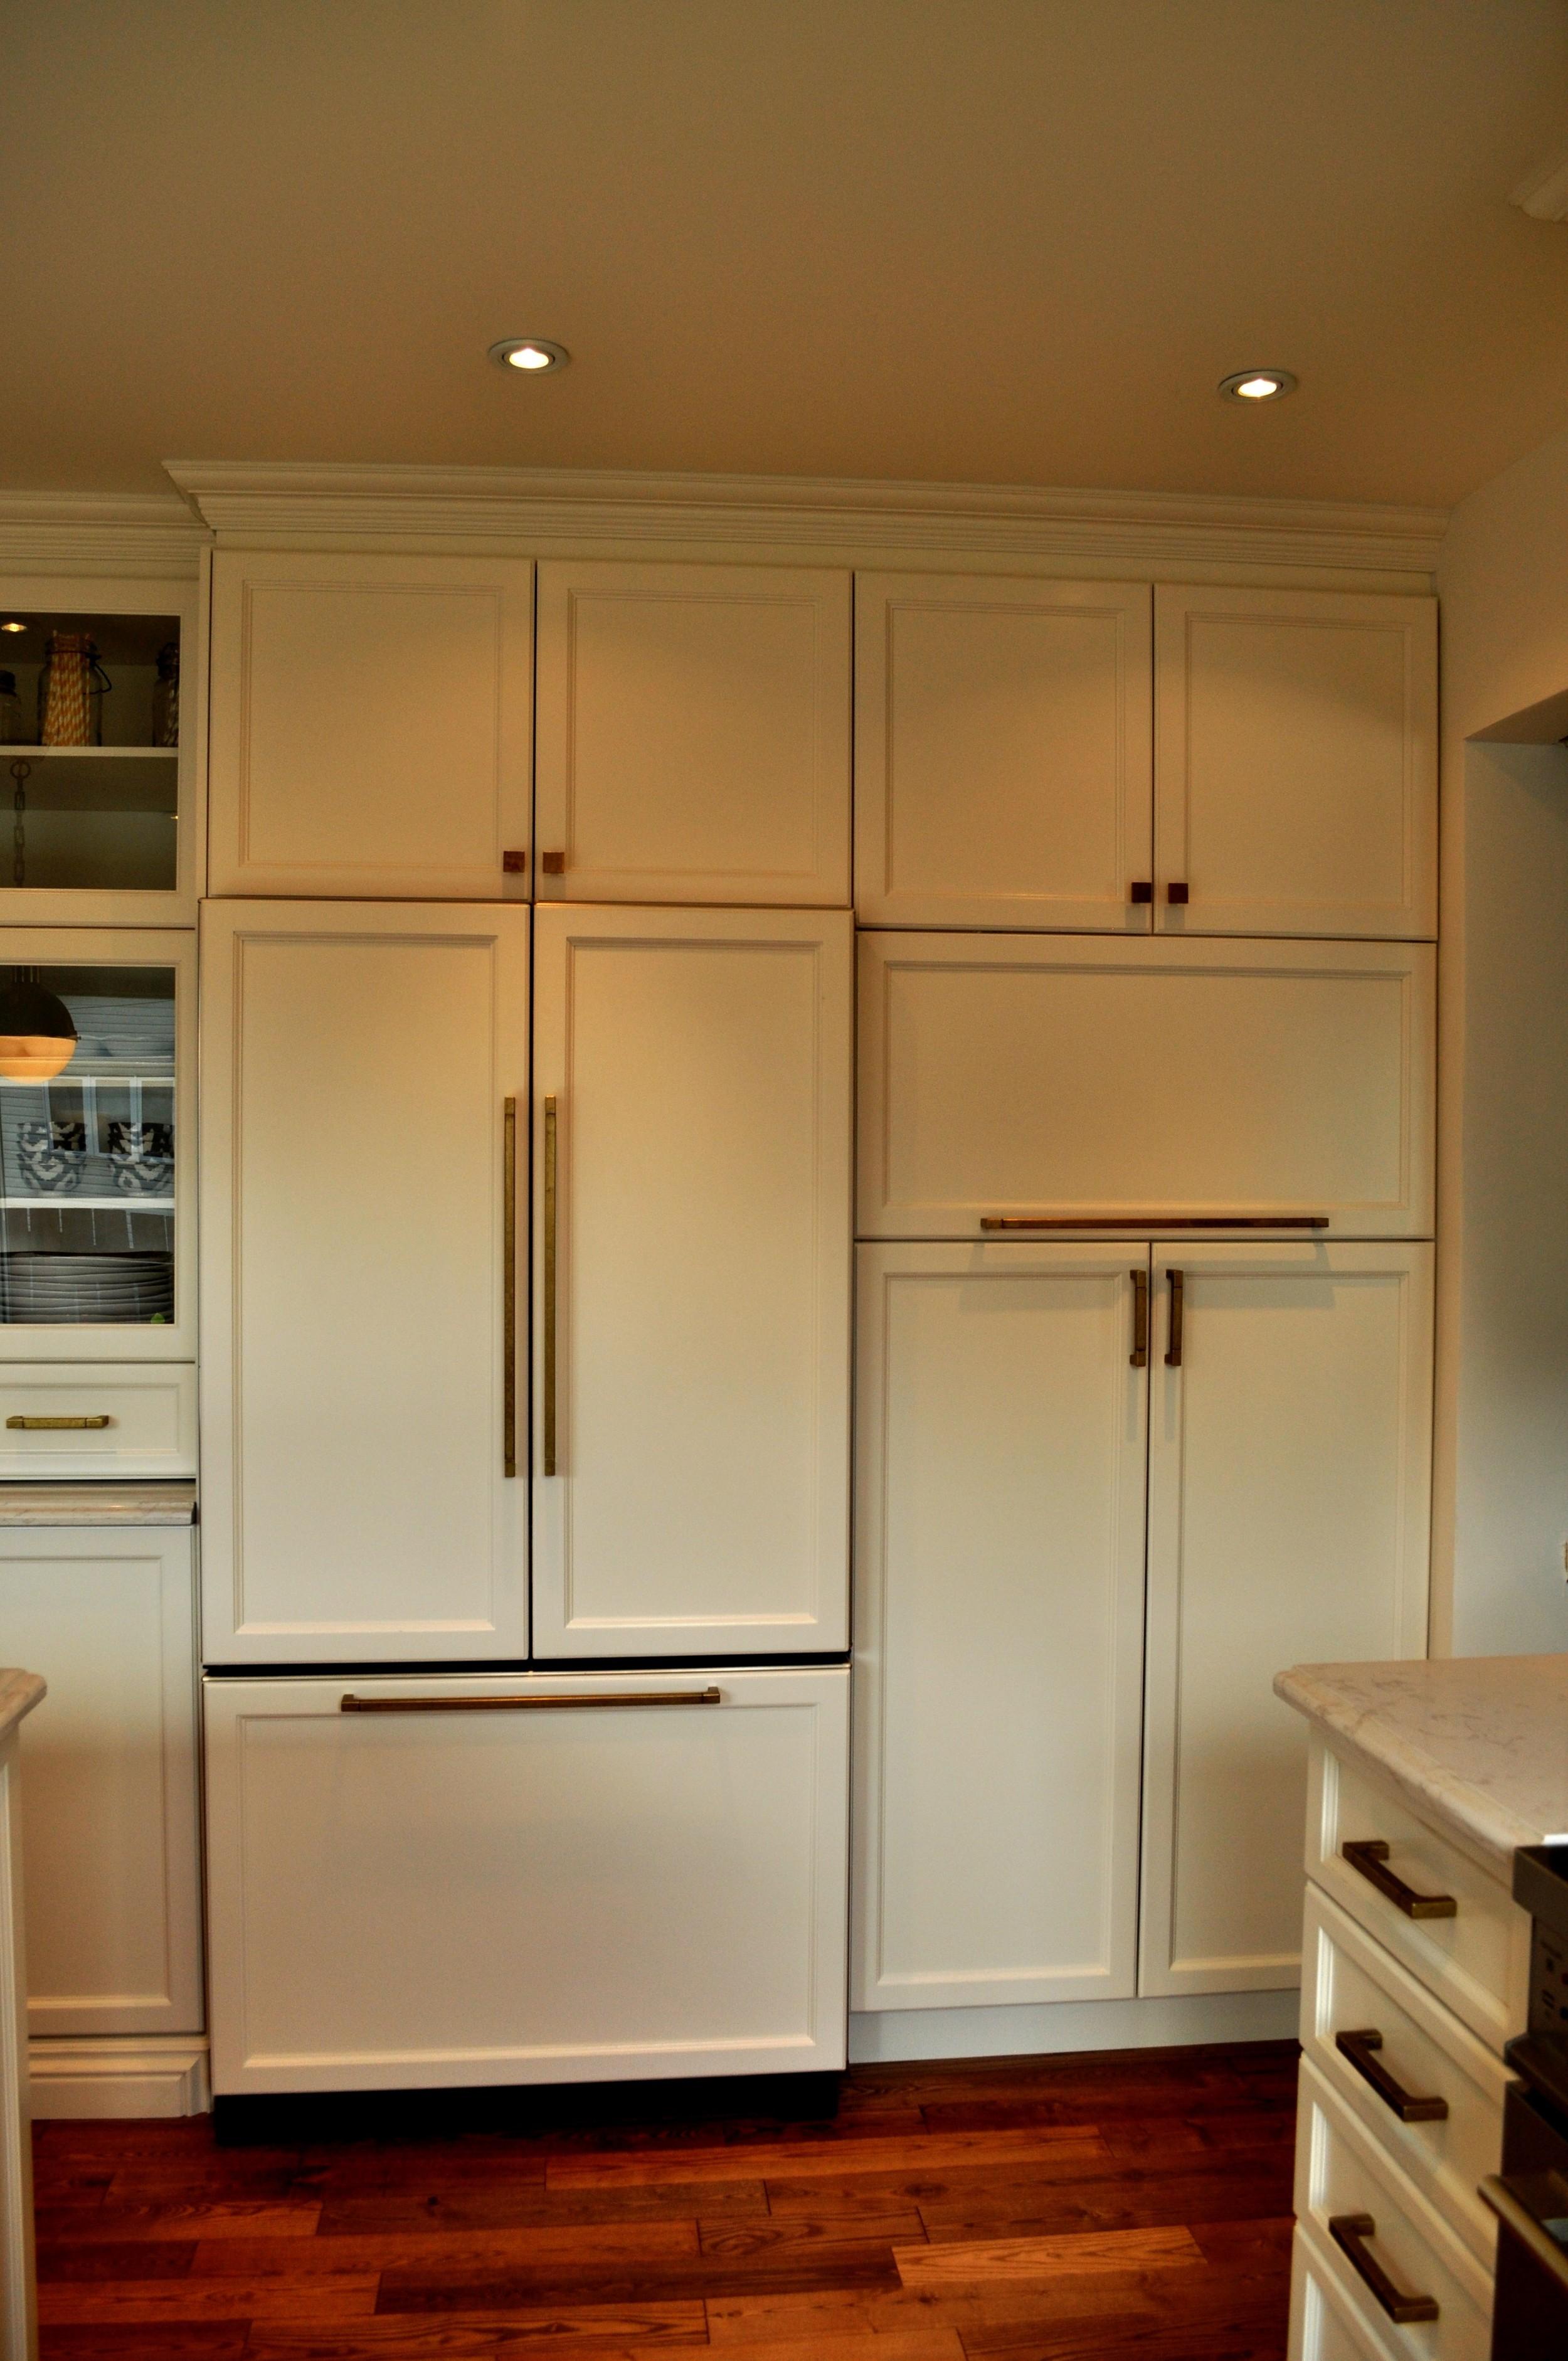 Velvet Toolbox Kitchen, pantry and fridge section